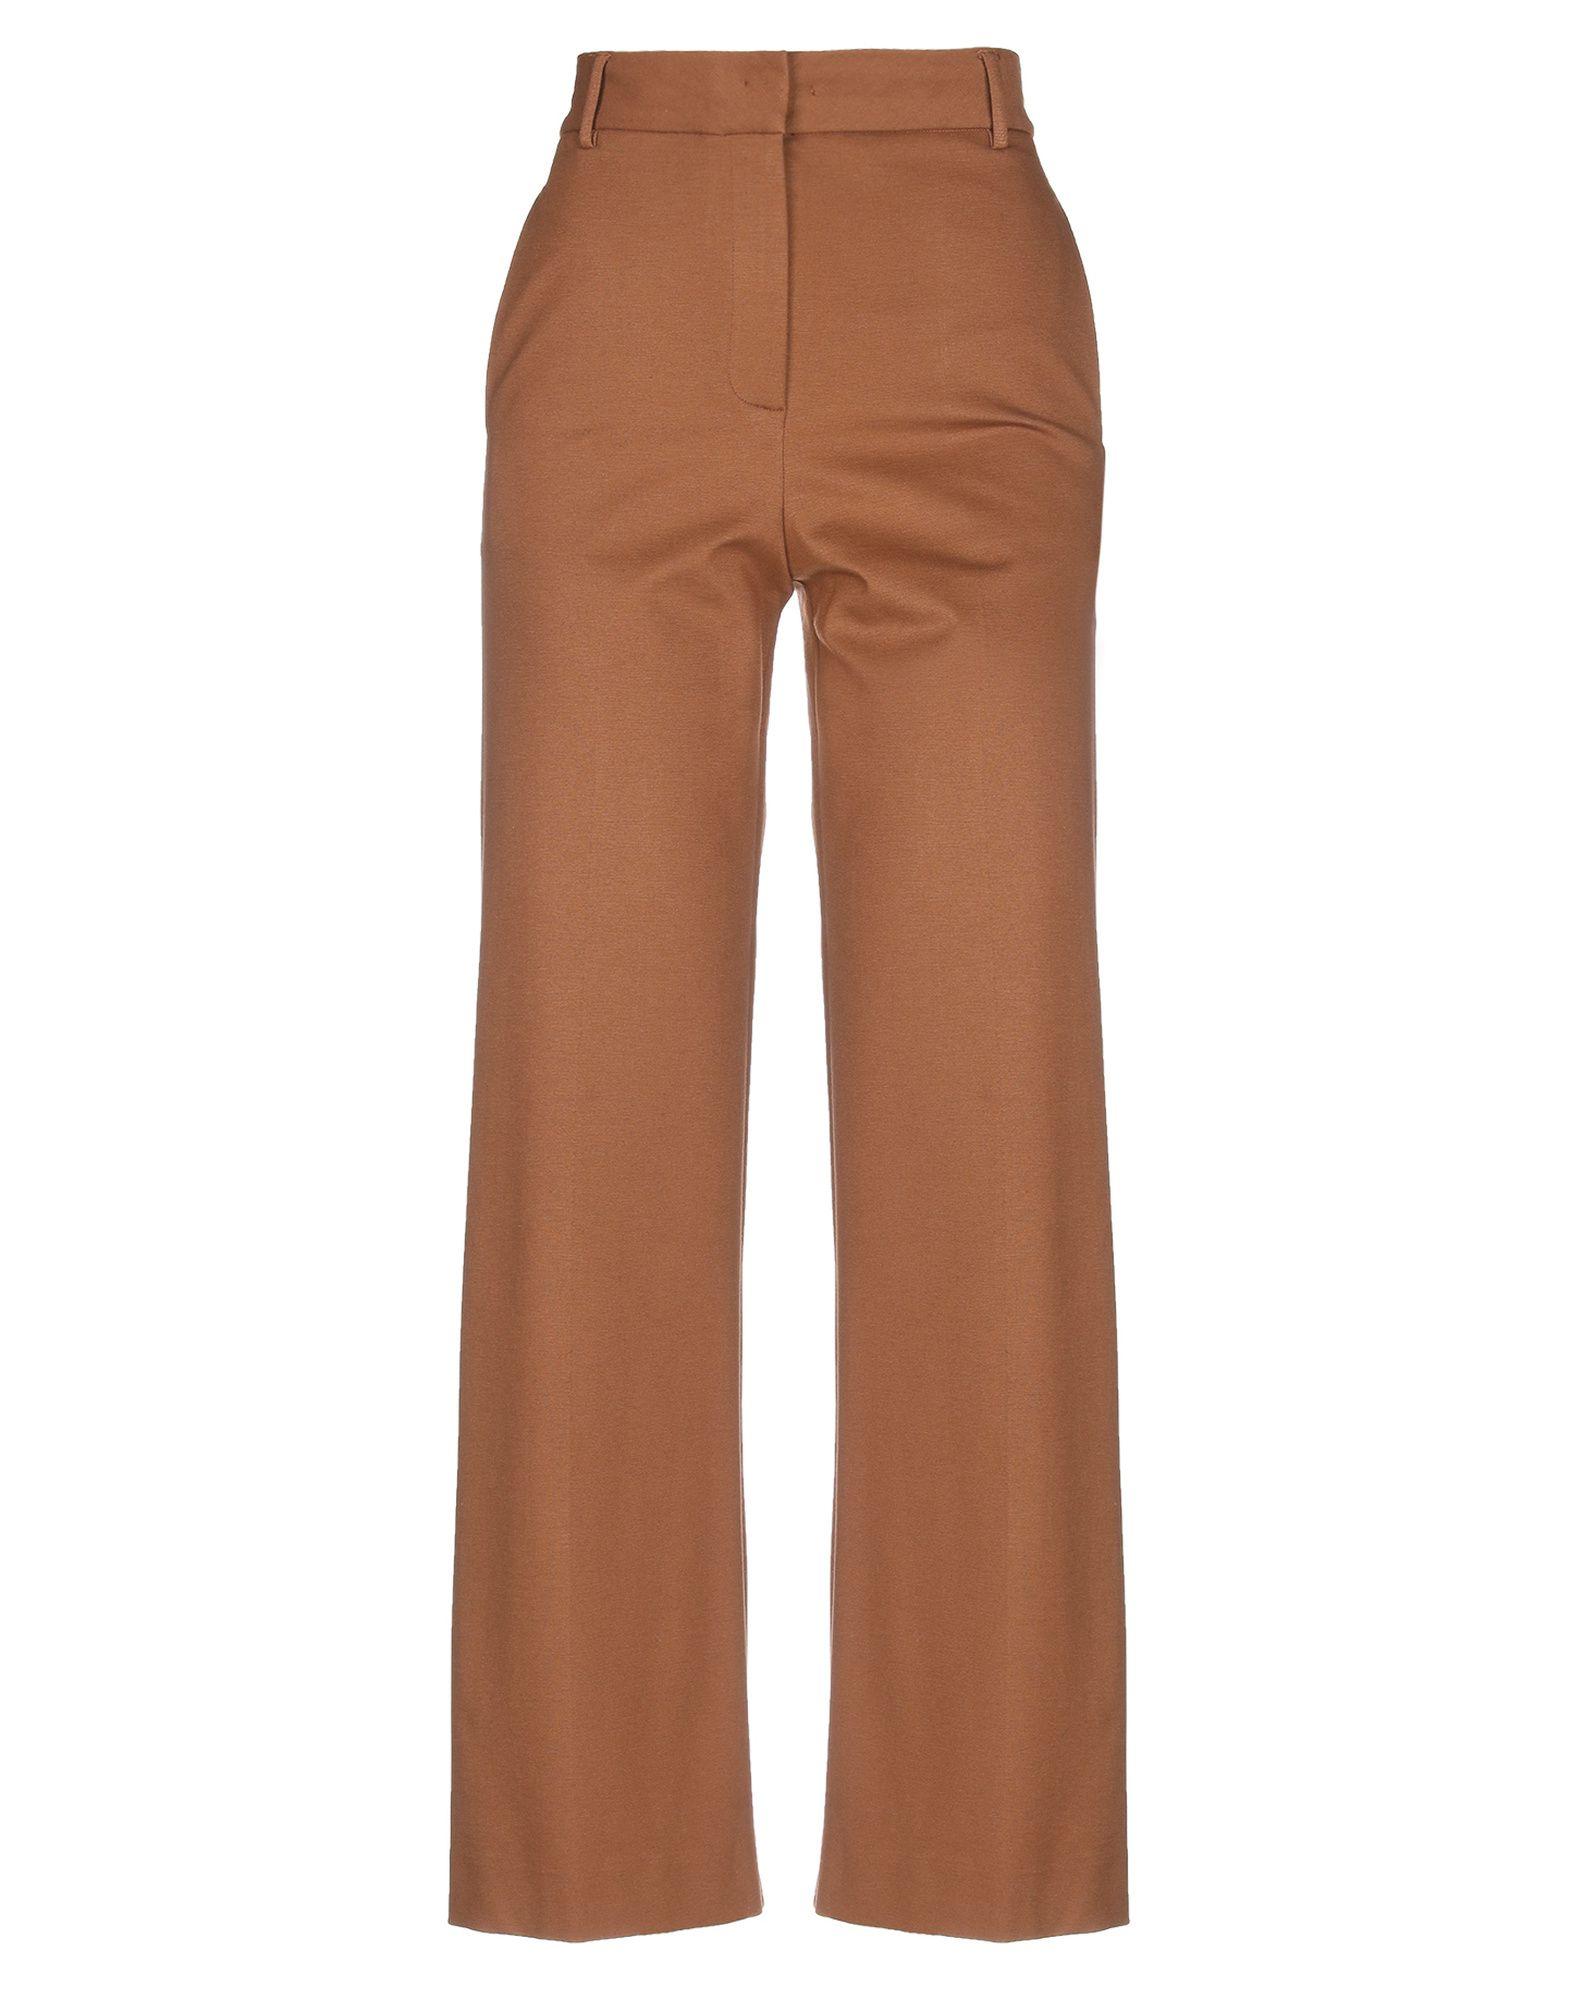 Картинки одежда брюки женские